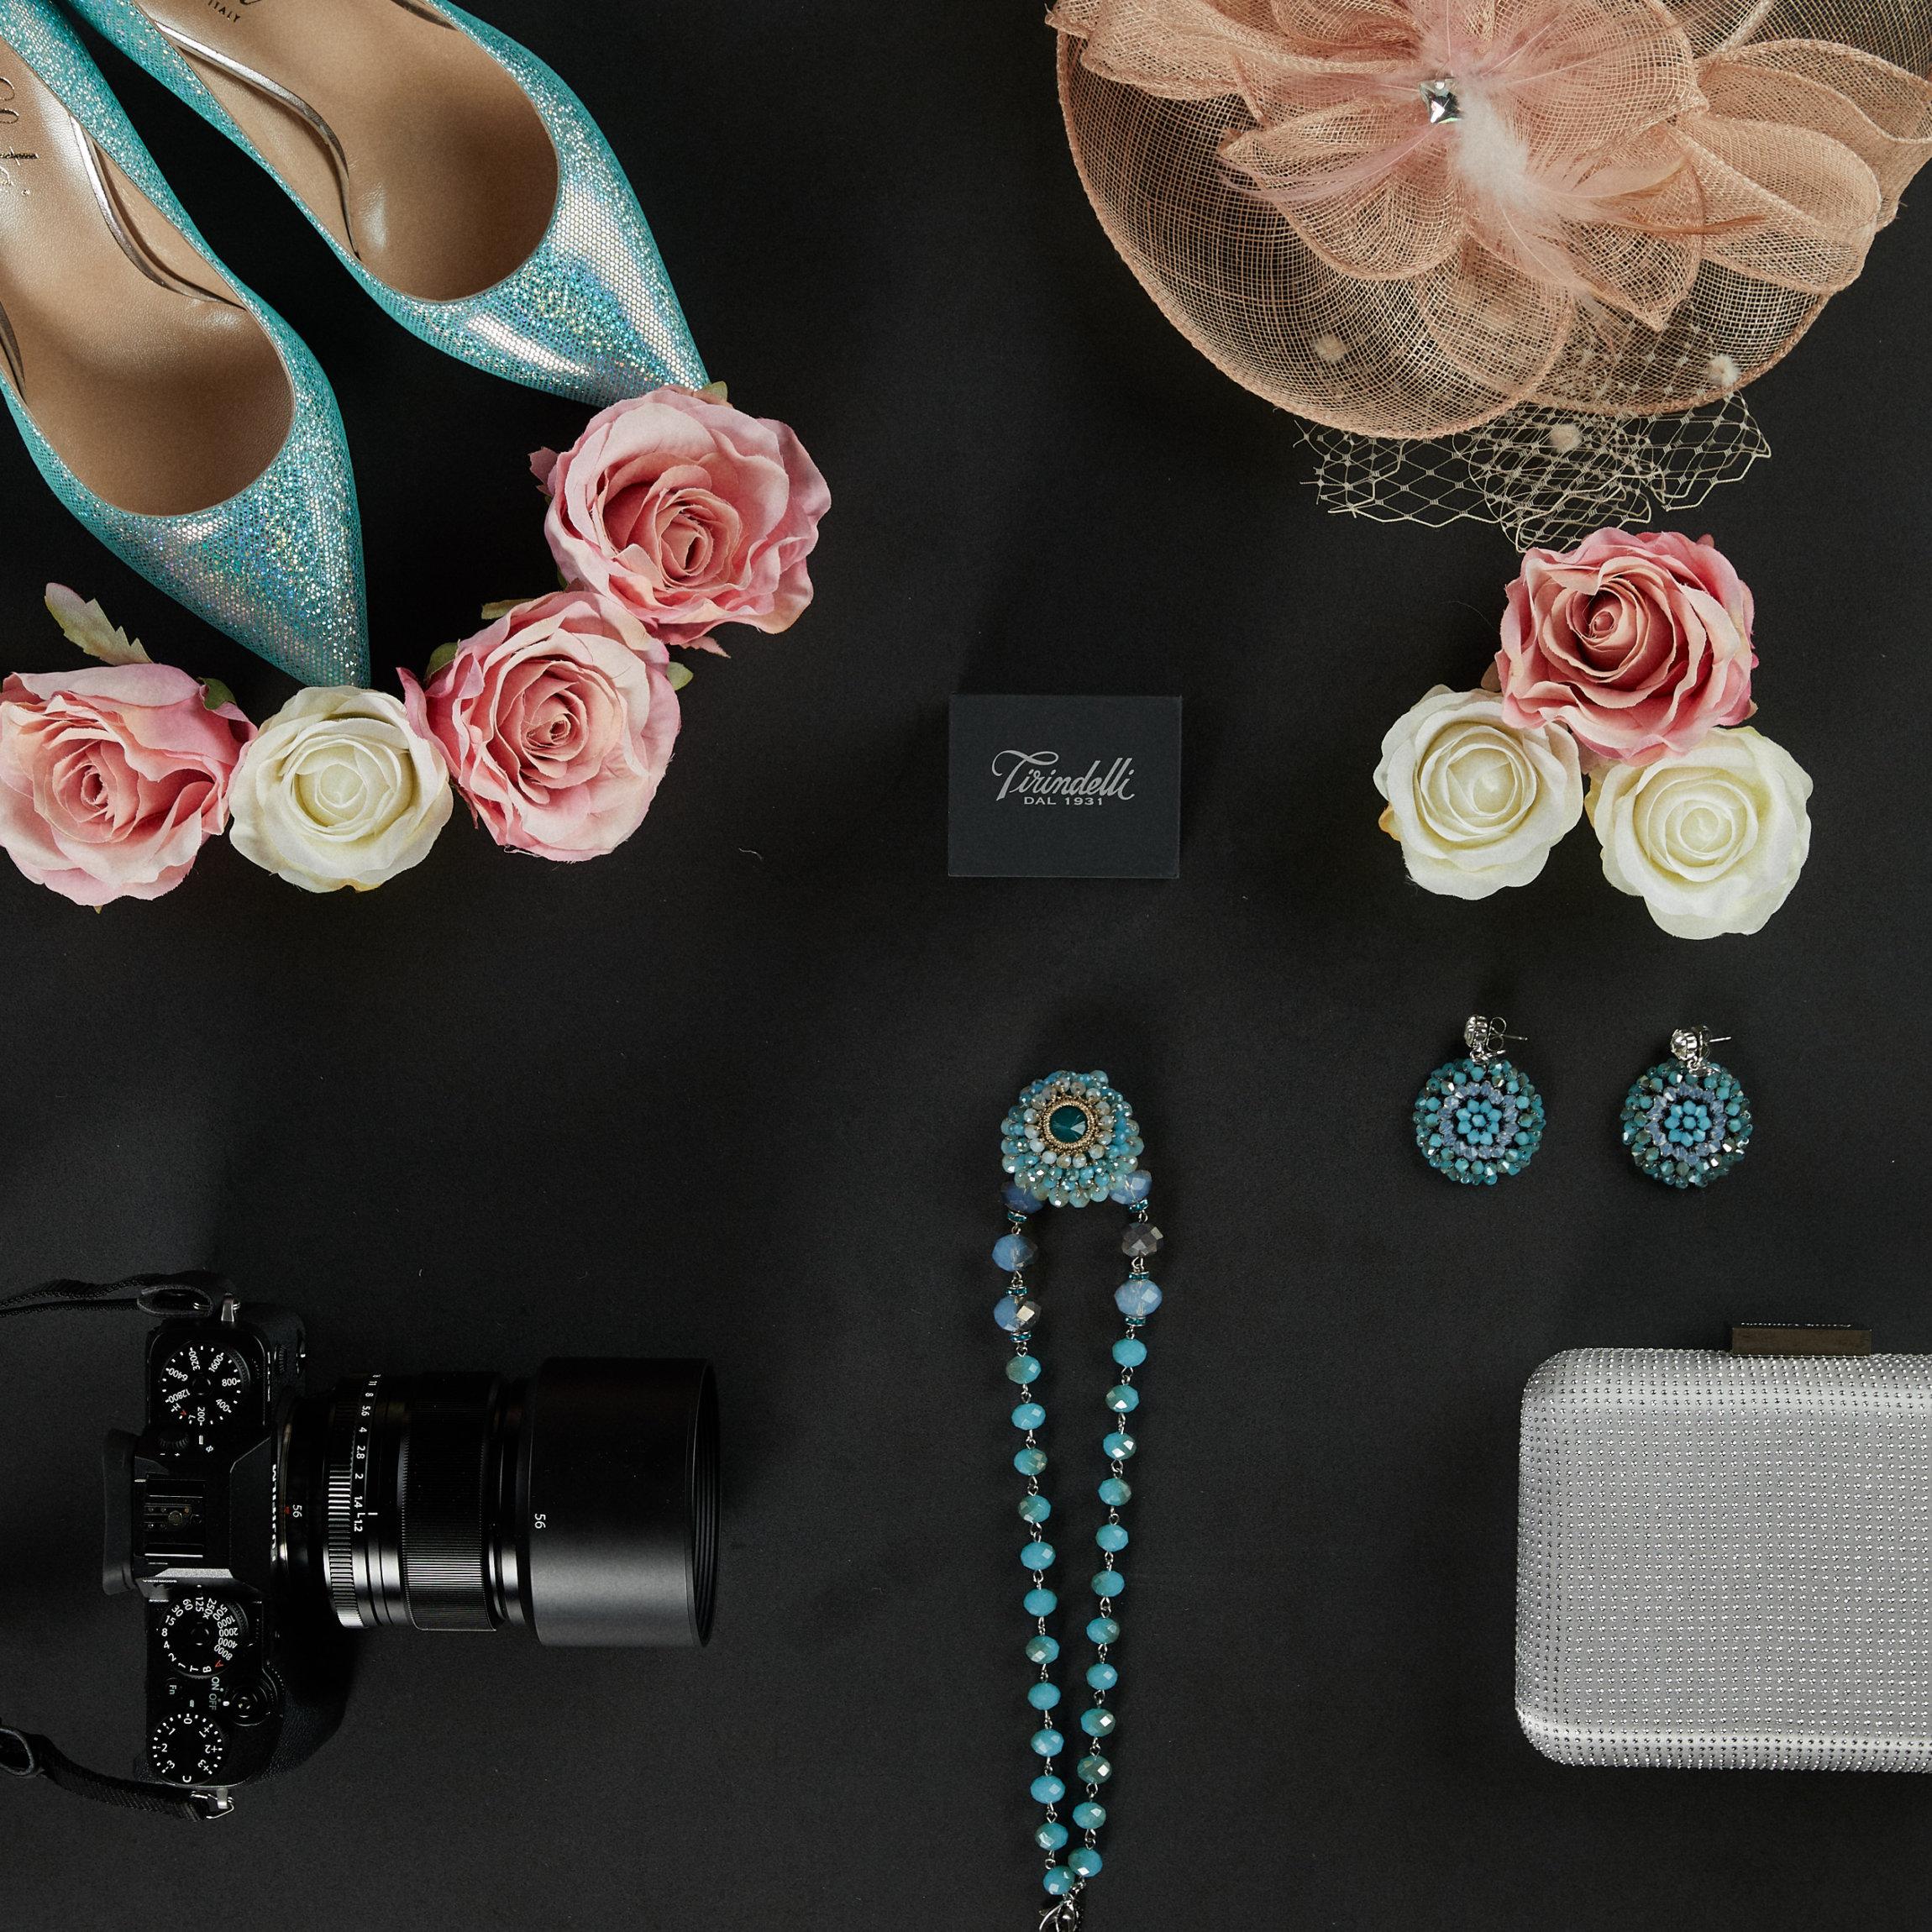 Tirindelli accessori donna